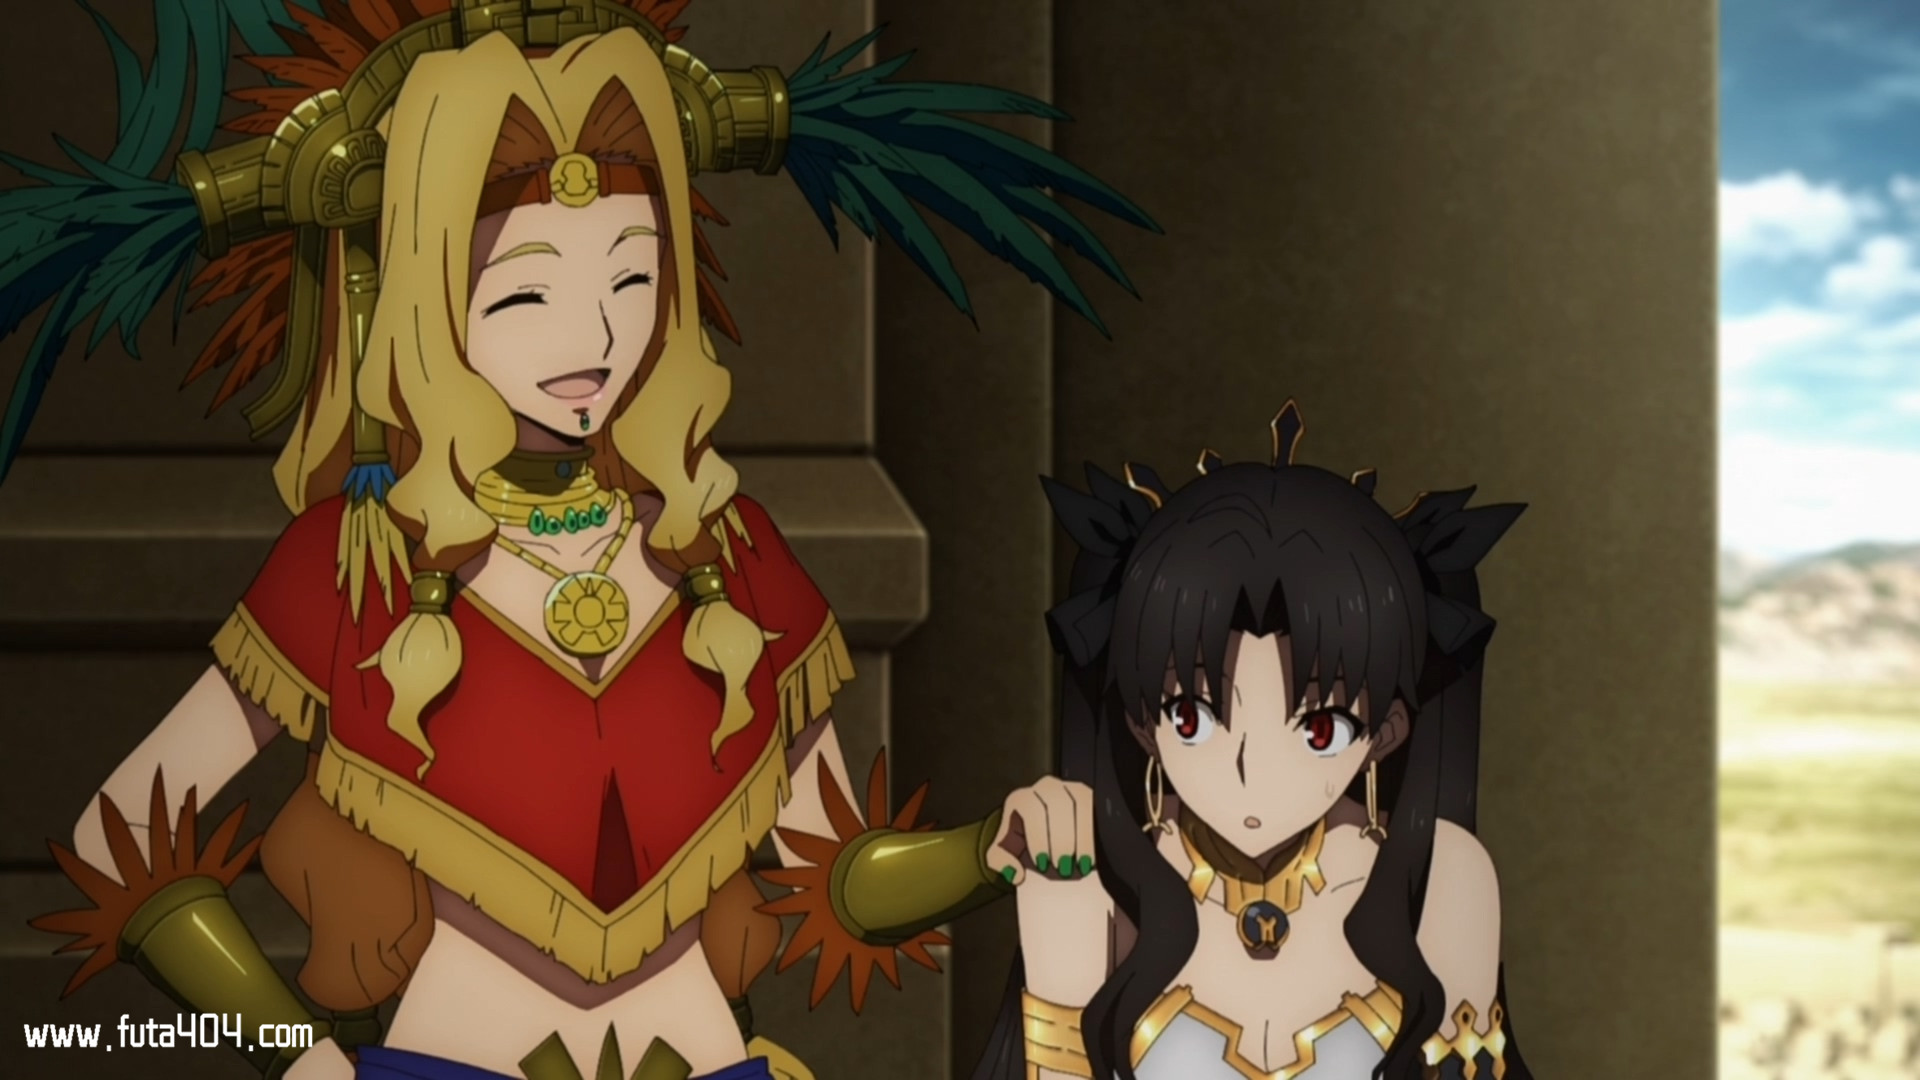 Fate Grand Order 绝对魔兽战线巴比伦尼亚 第12话 Fate Grand Order 动画在线 第1张